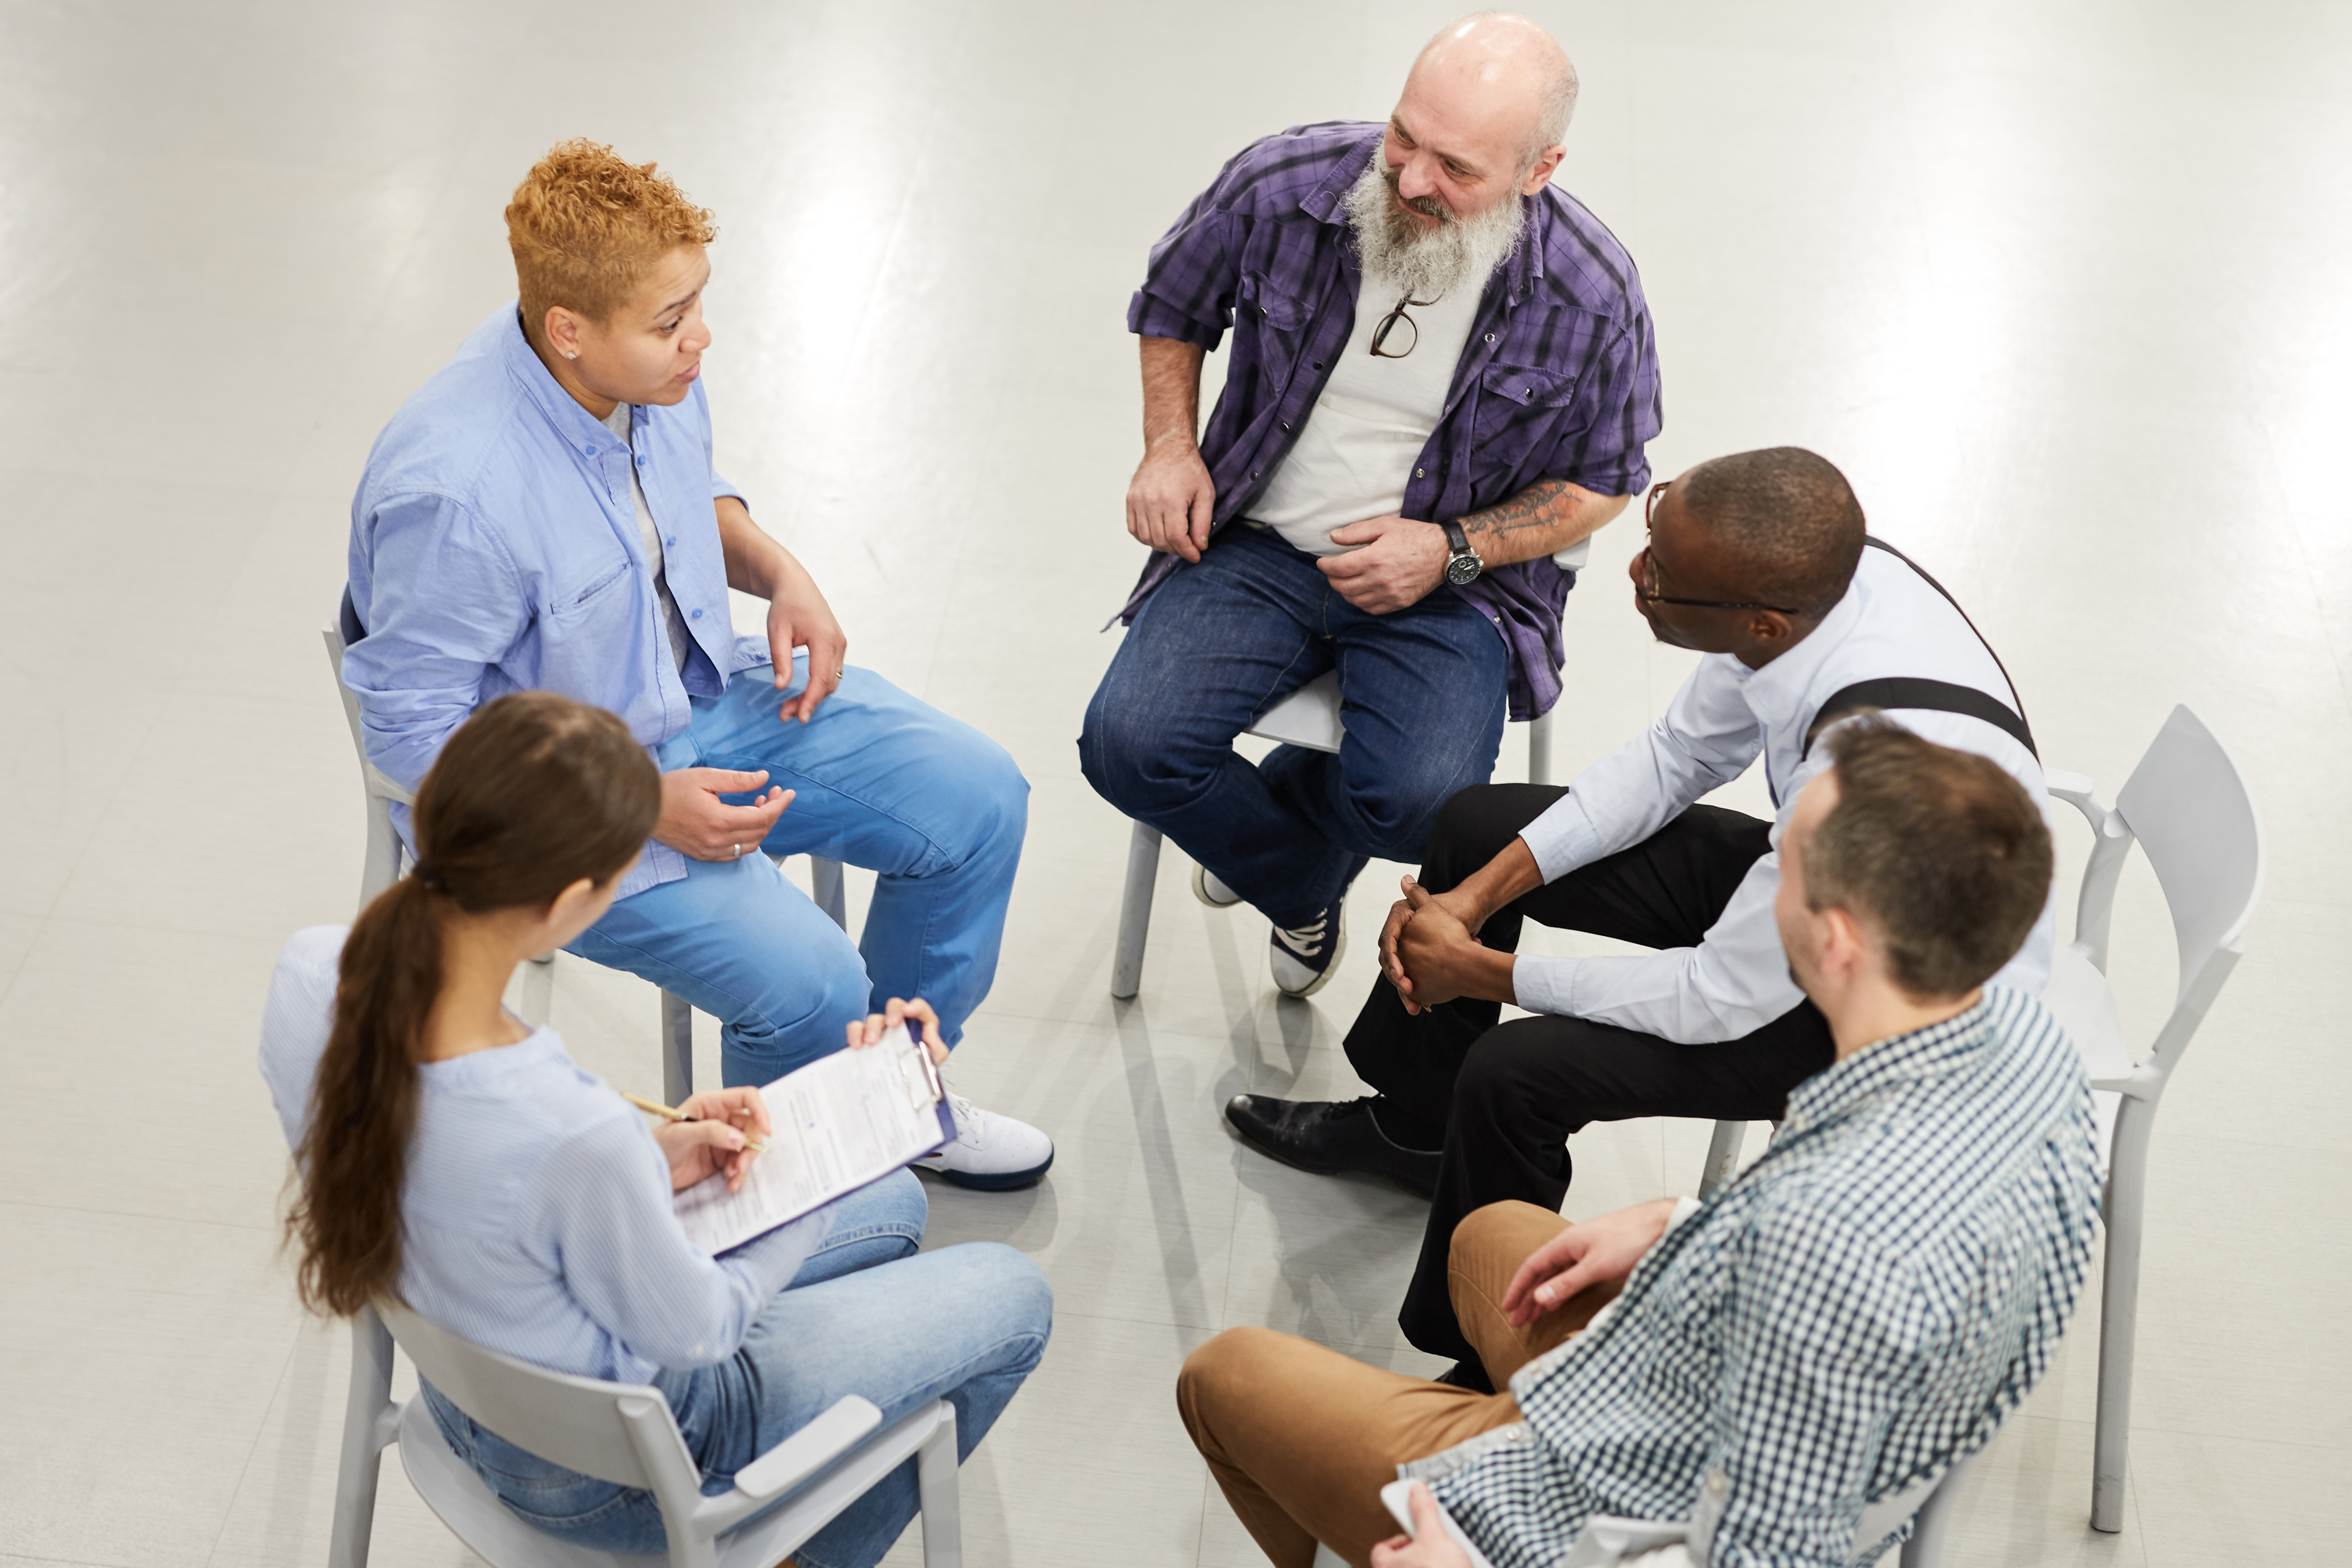 centros de ingreso rehabilitacion alcoholicos en madrid - terapia